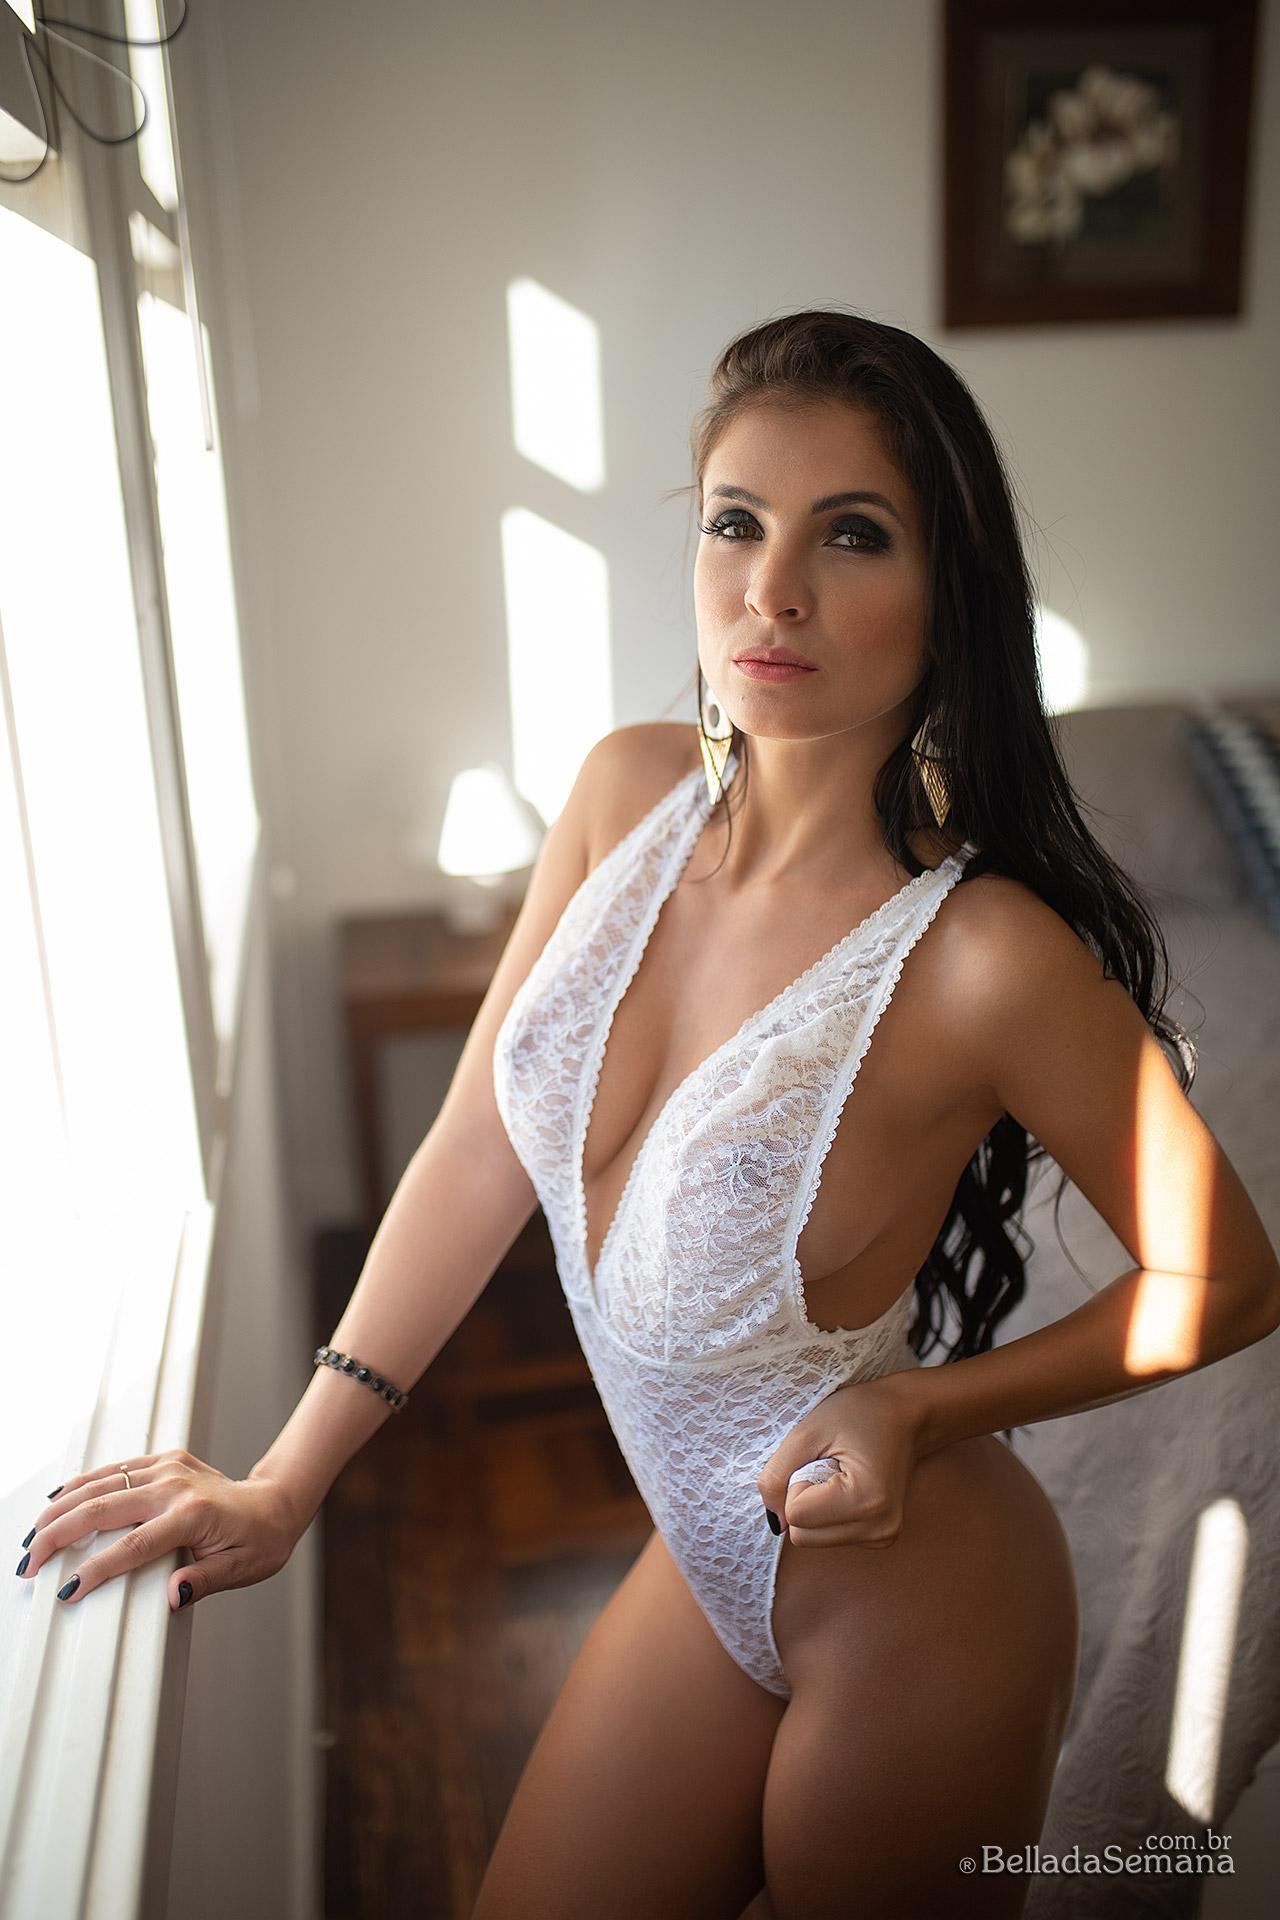 Fran Rosa | Bella da Semana